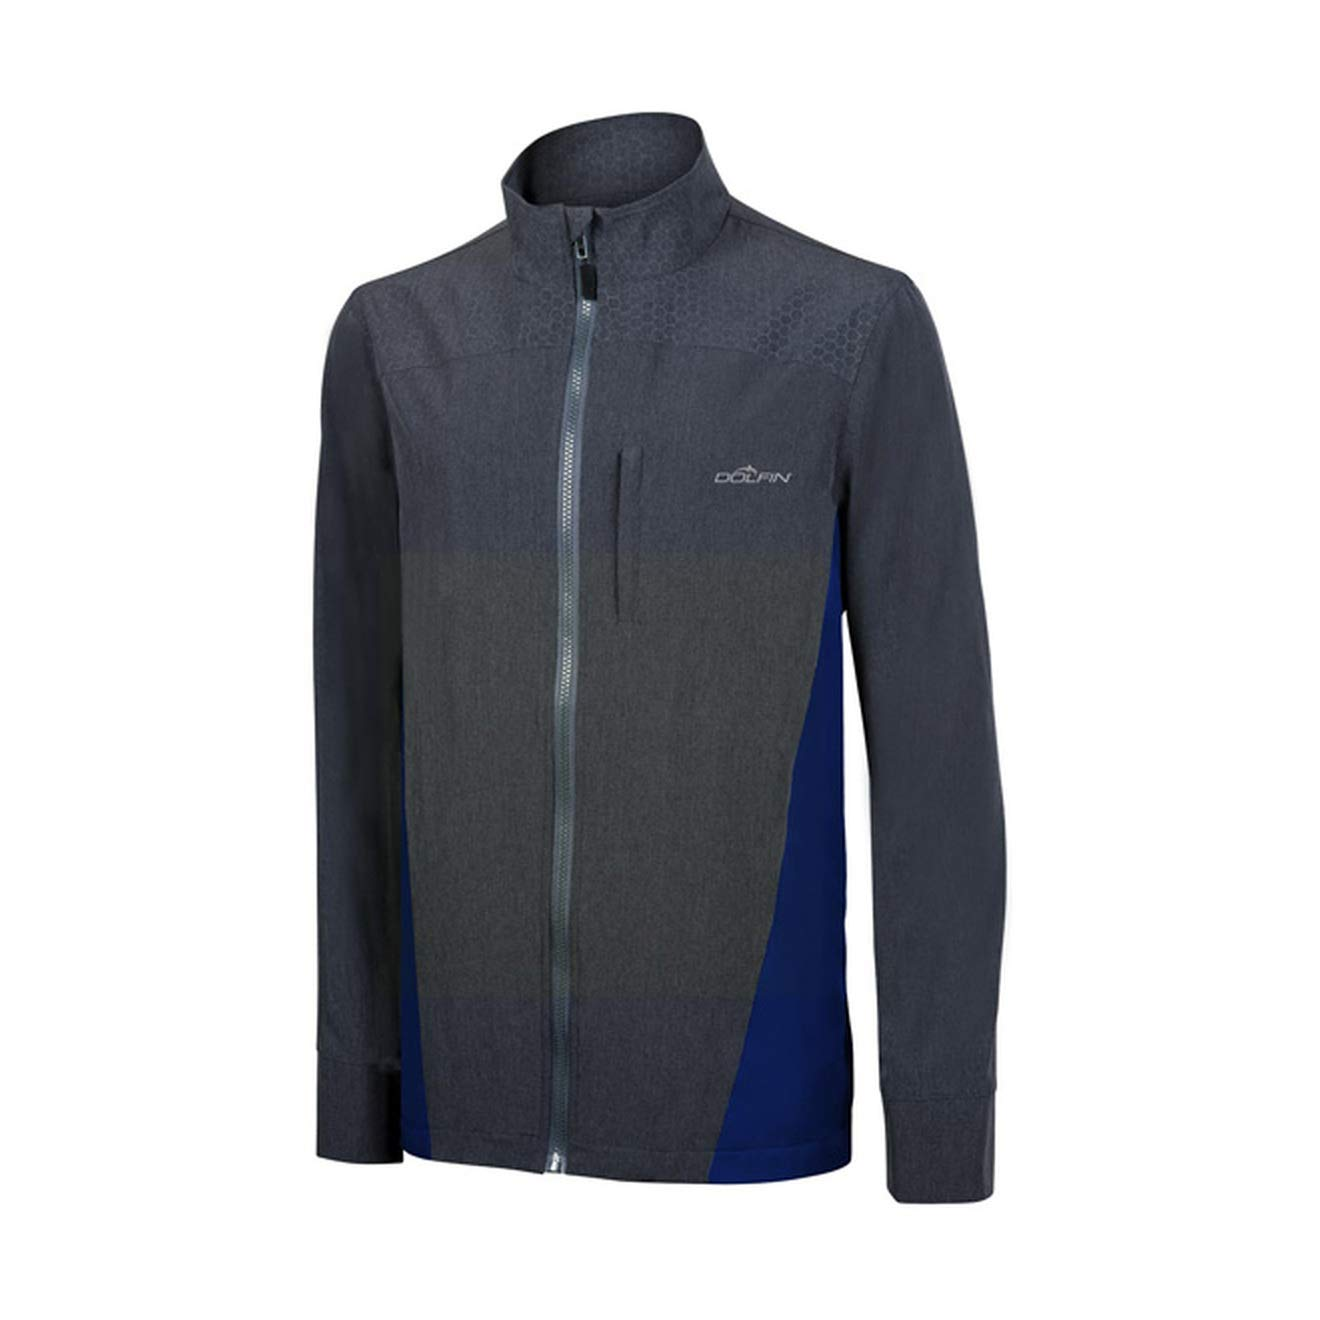 Dolfin Mens Warm-Up Jacket